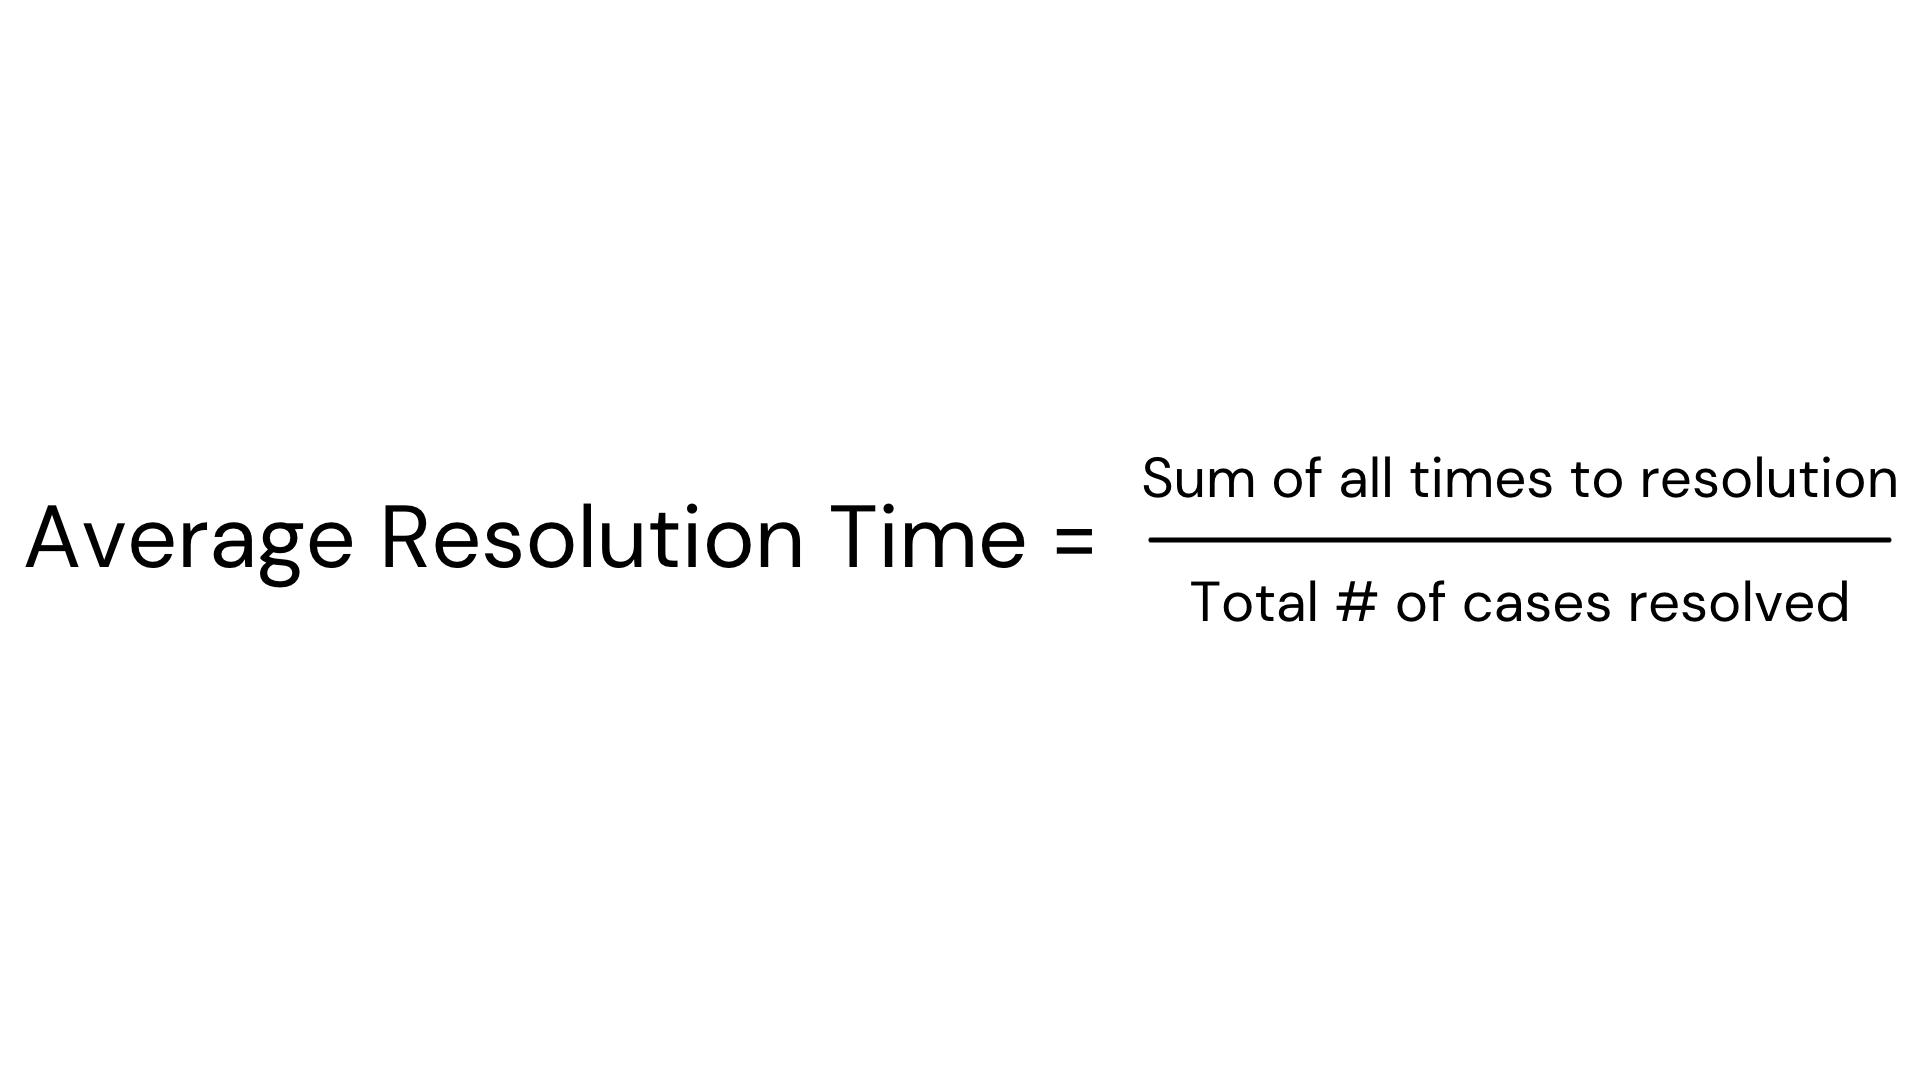 Average Resolution Time formula